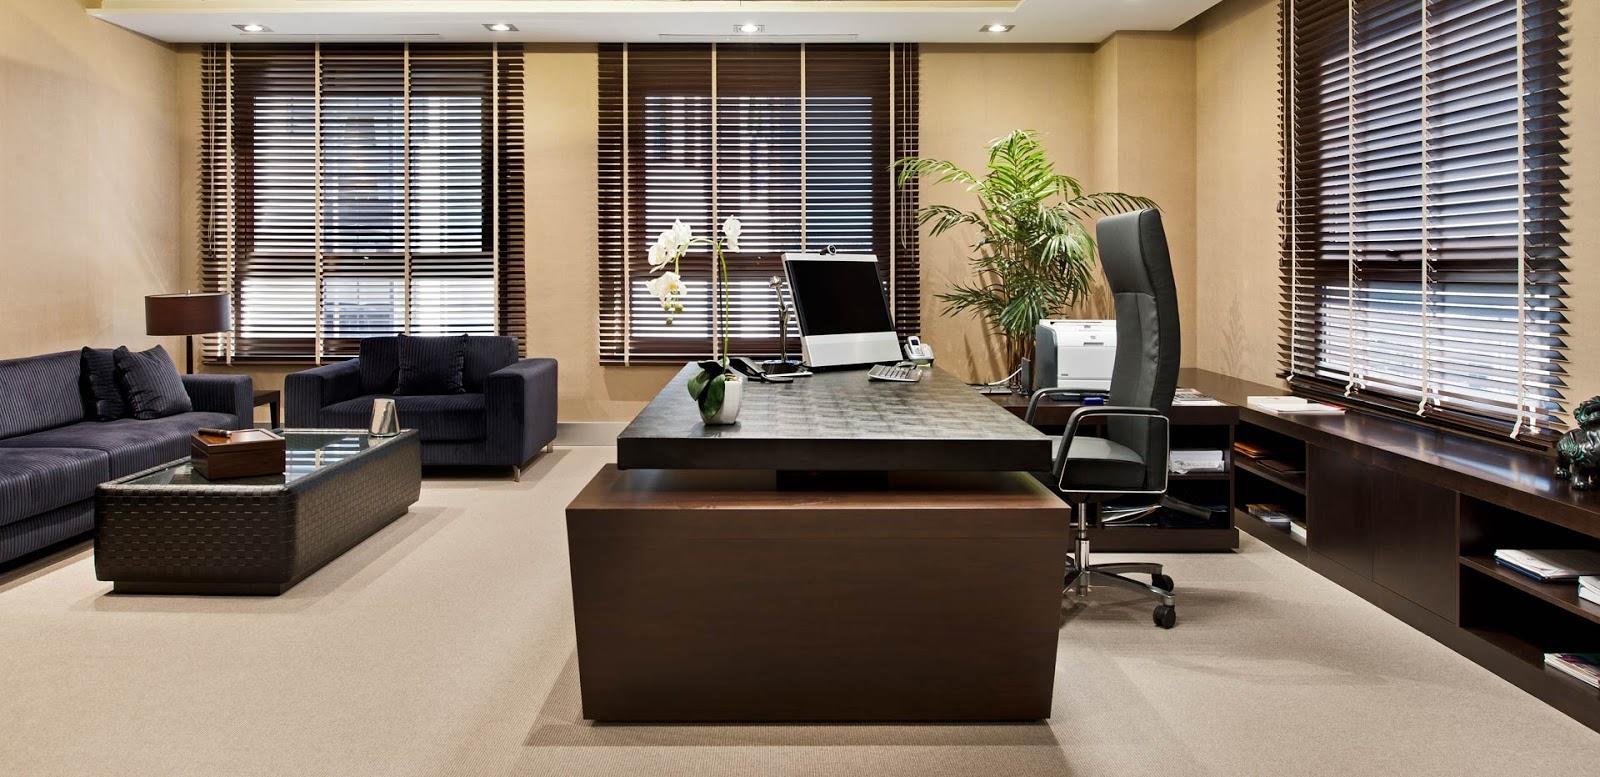 Suministros anbo comunicaciones muebles oficina para for Direccion oficina